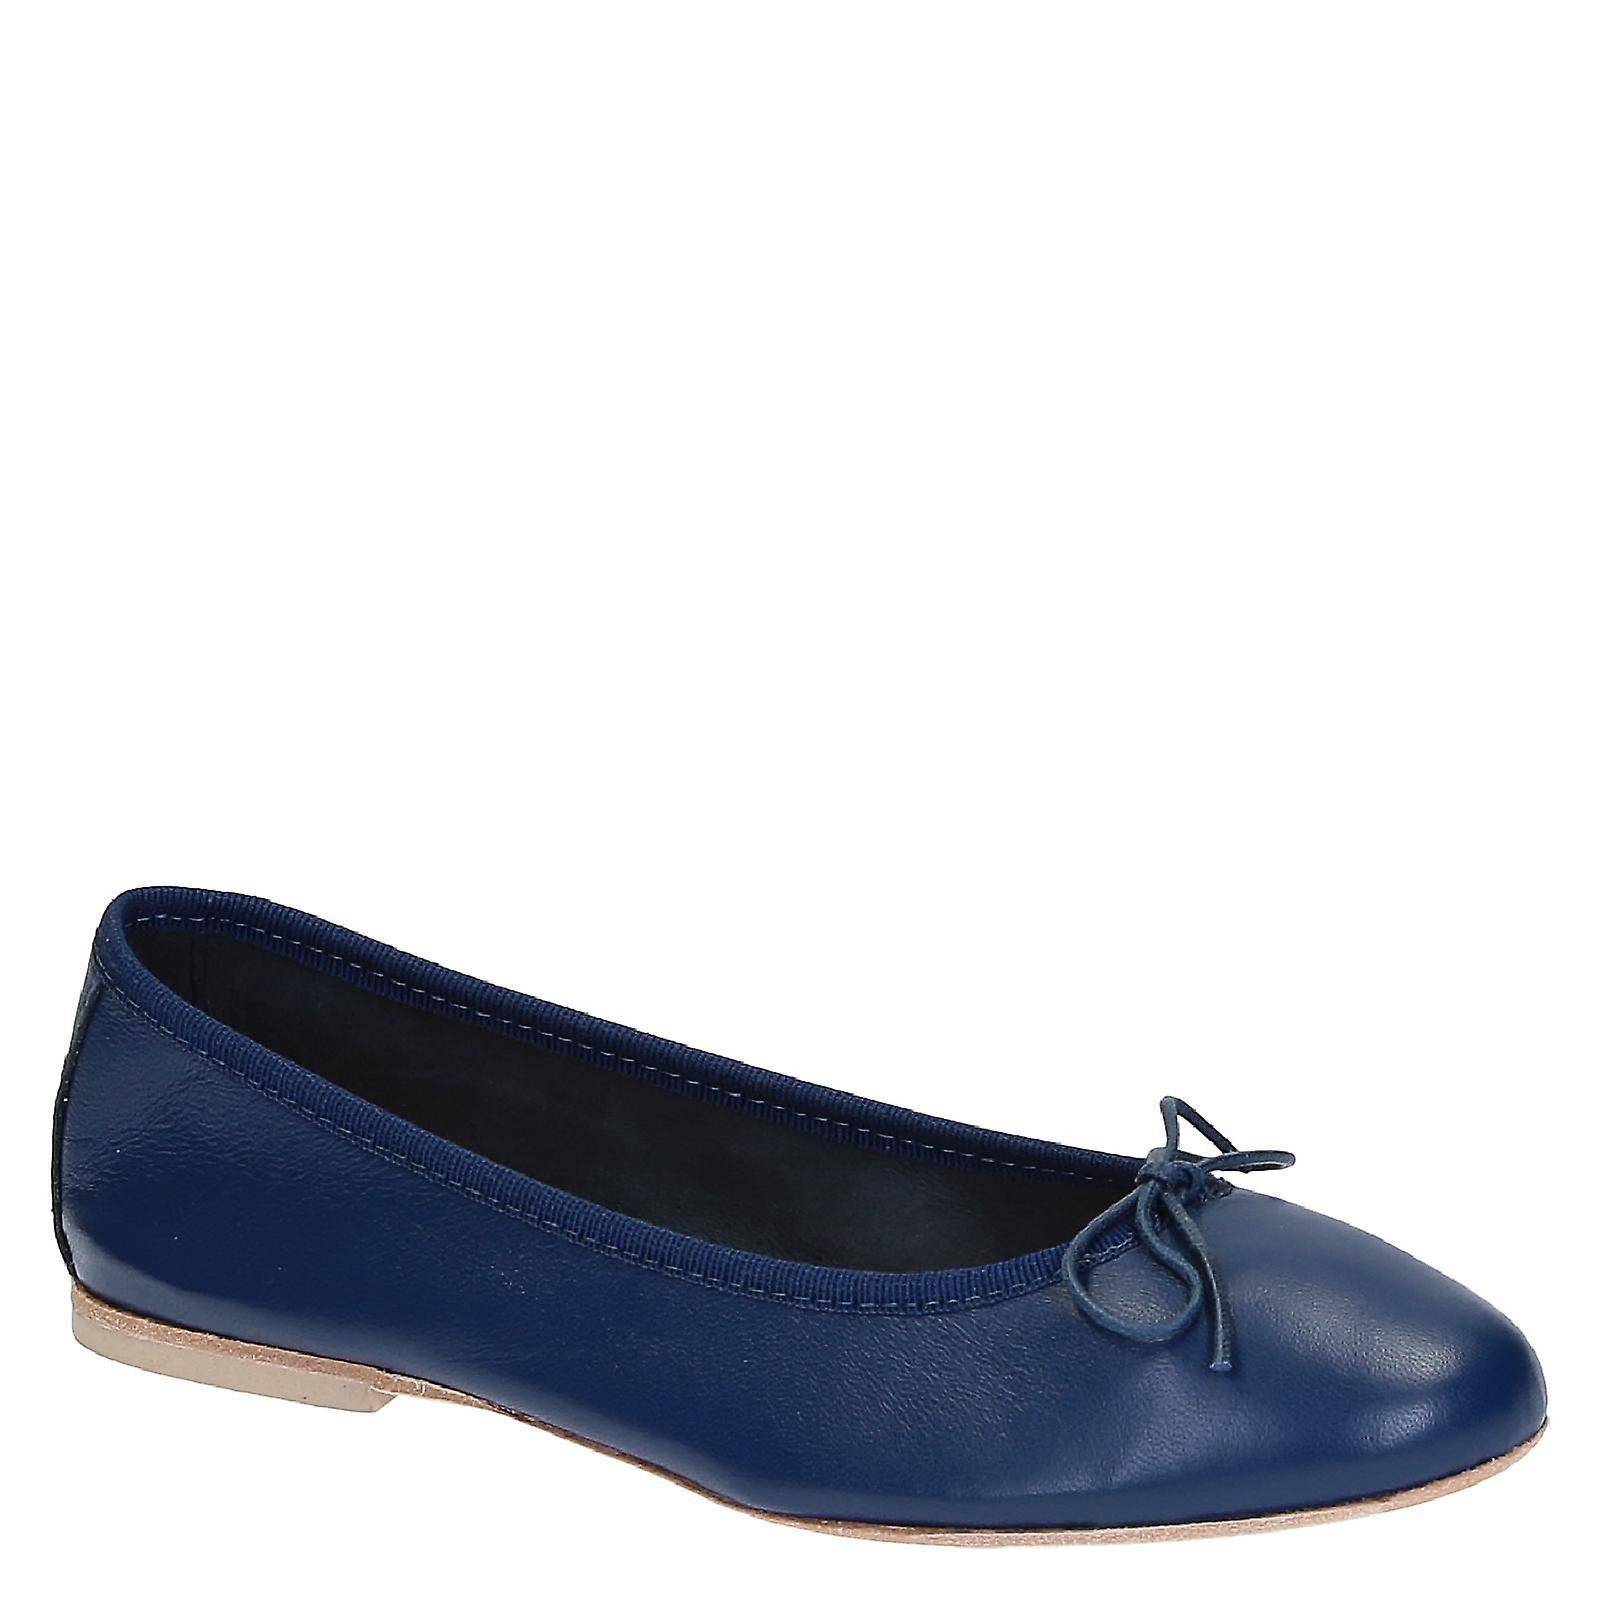 Handmade flats ballets chaussures in bleu soft leather